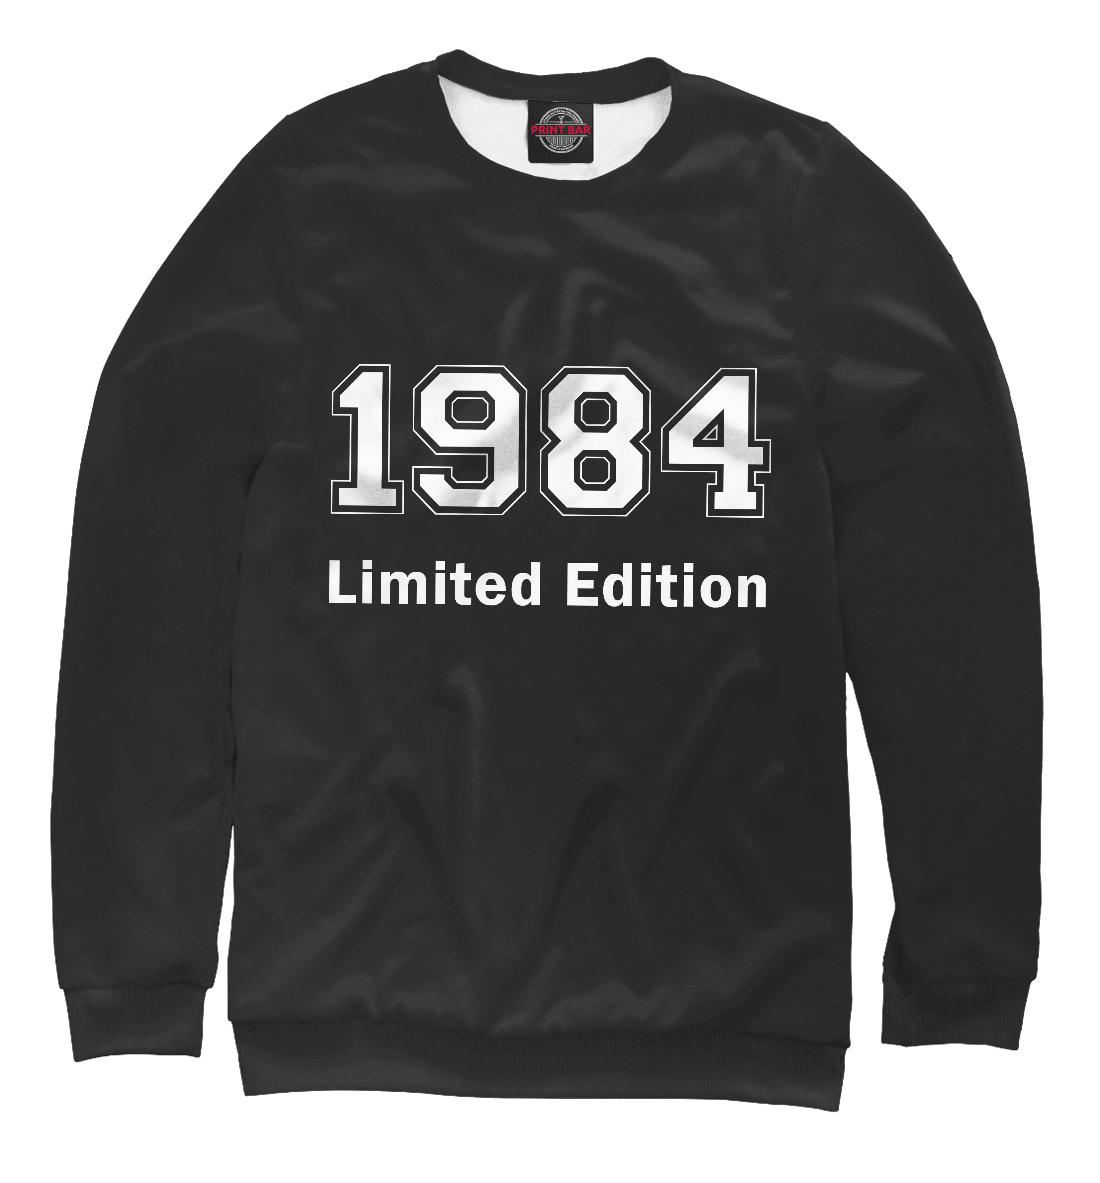 Купить 1984 Limited Edition, Printbar, Свитшоты, DVC-465851-swi-2